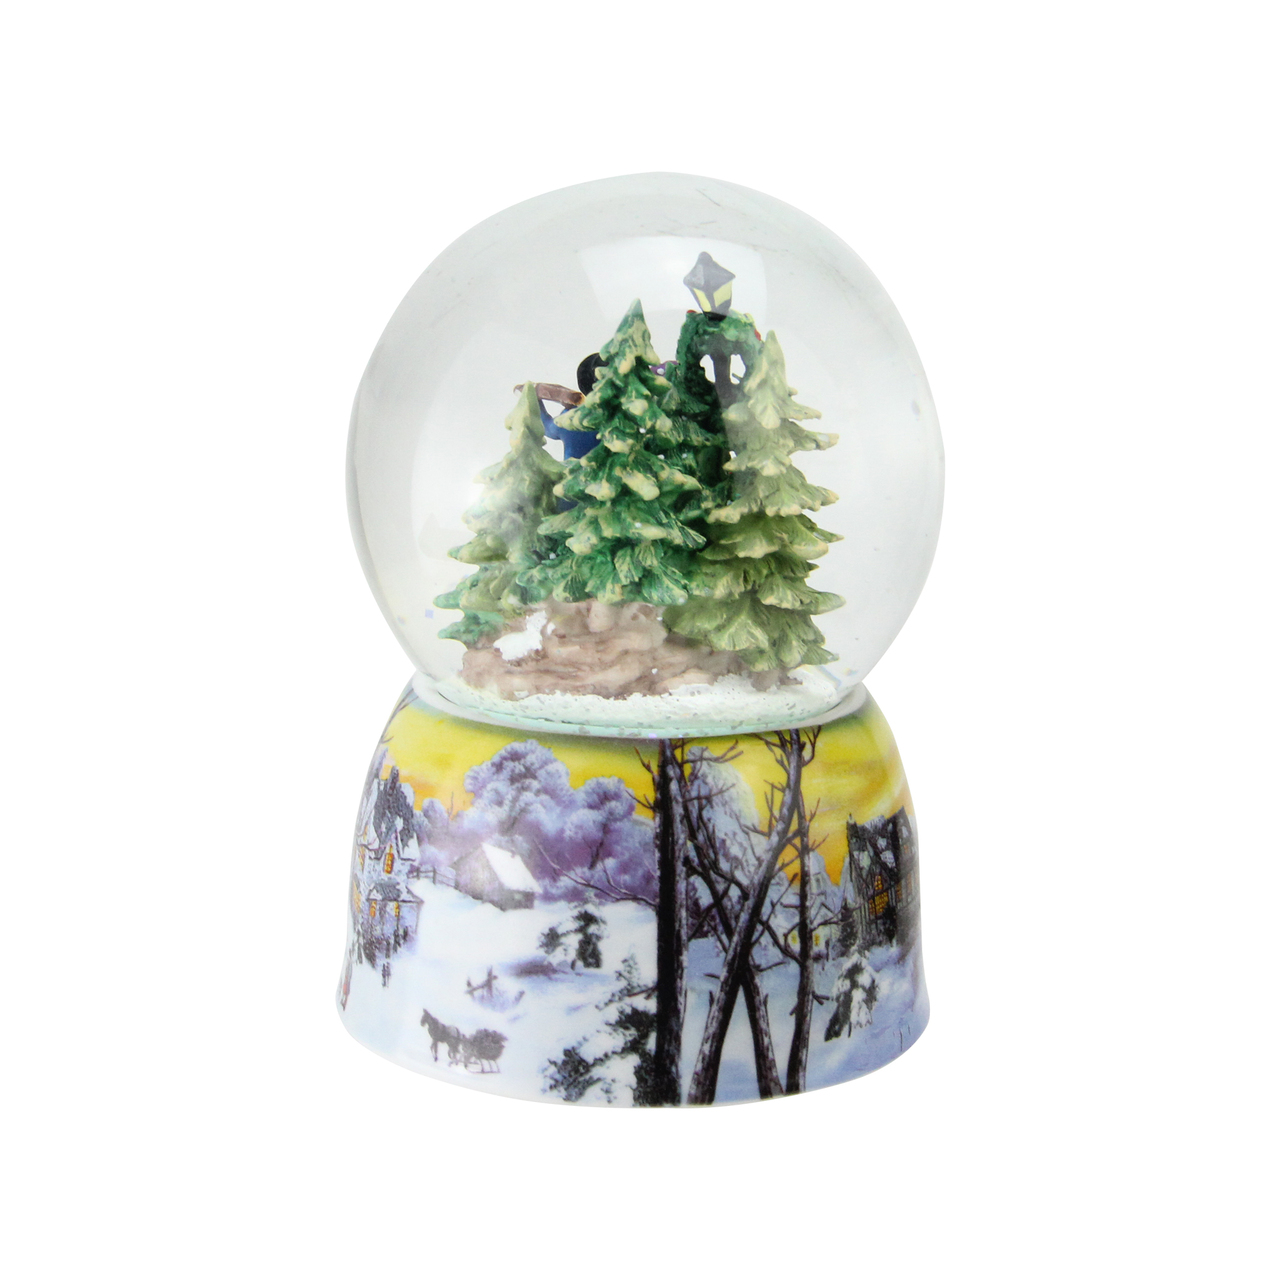 6 christmas carolers winter scene musical snow globe 32629127 - Christmas Musical Snow Globes